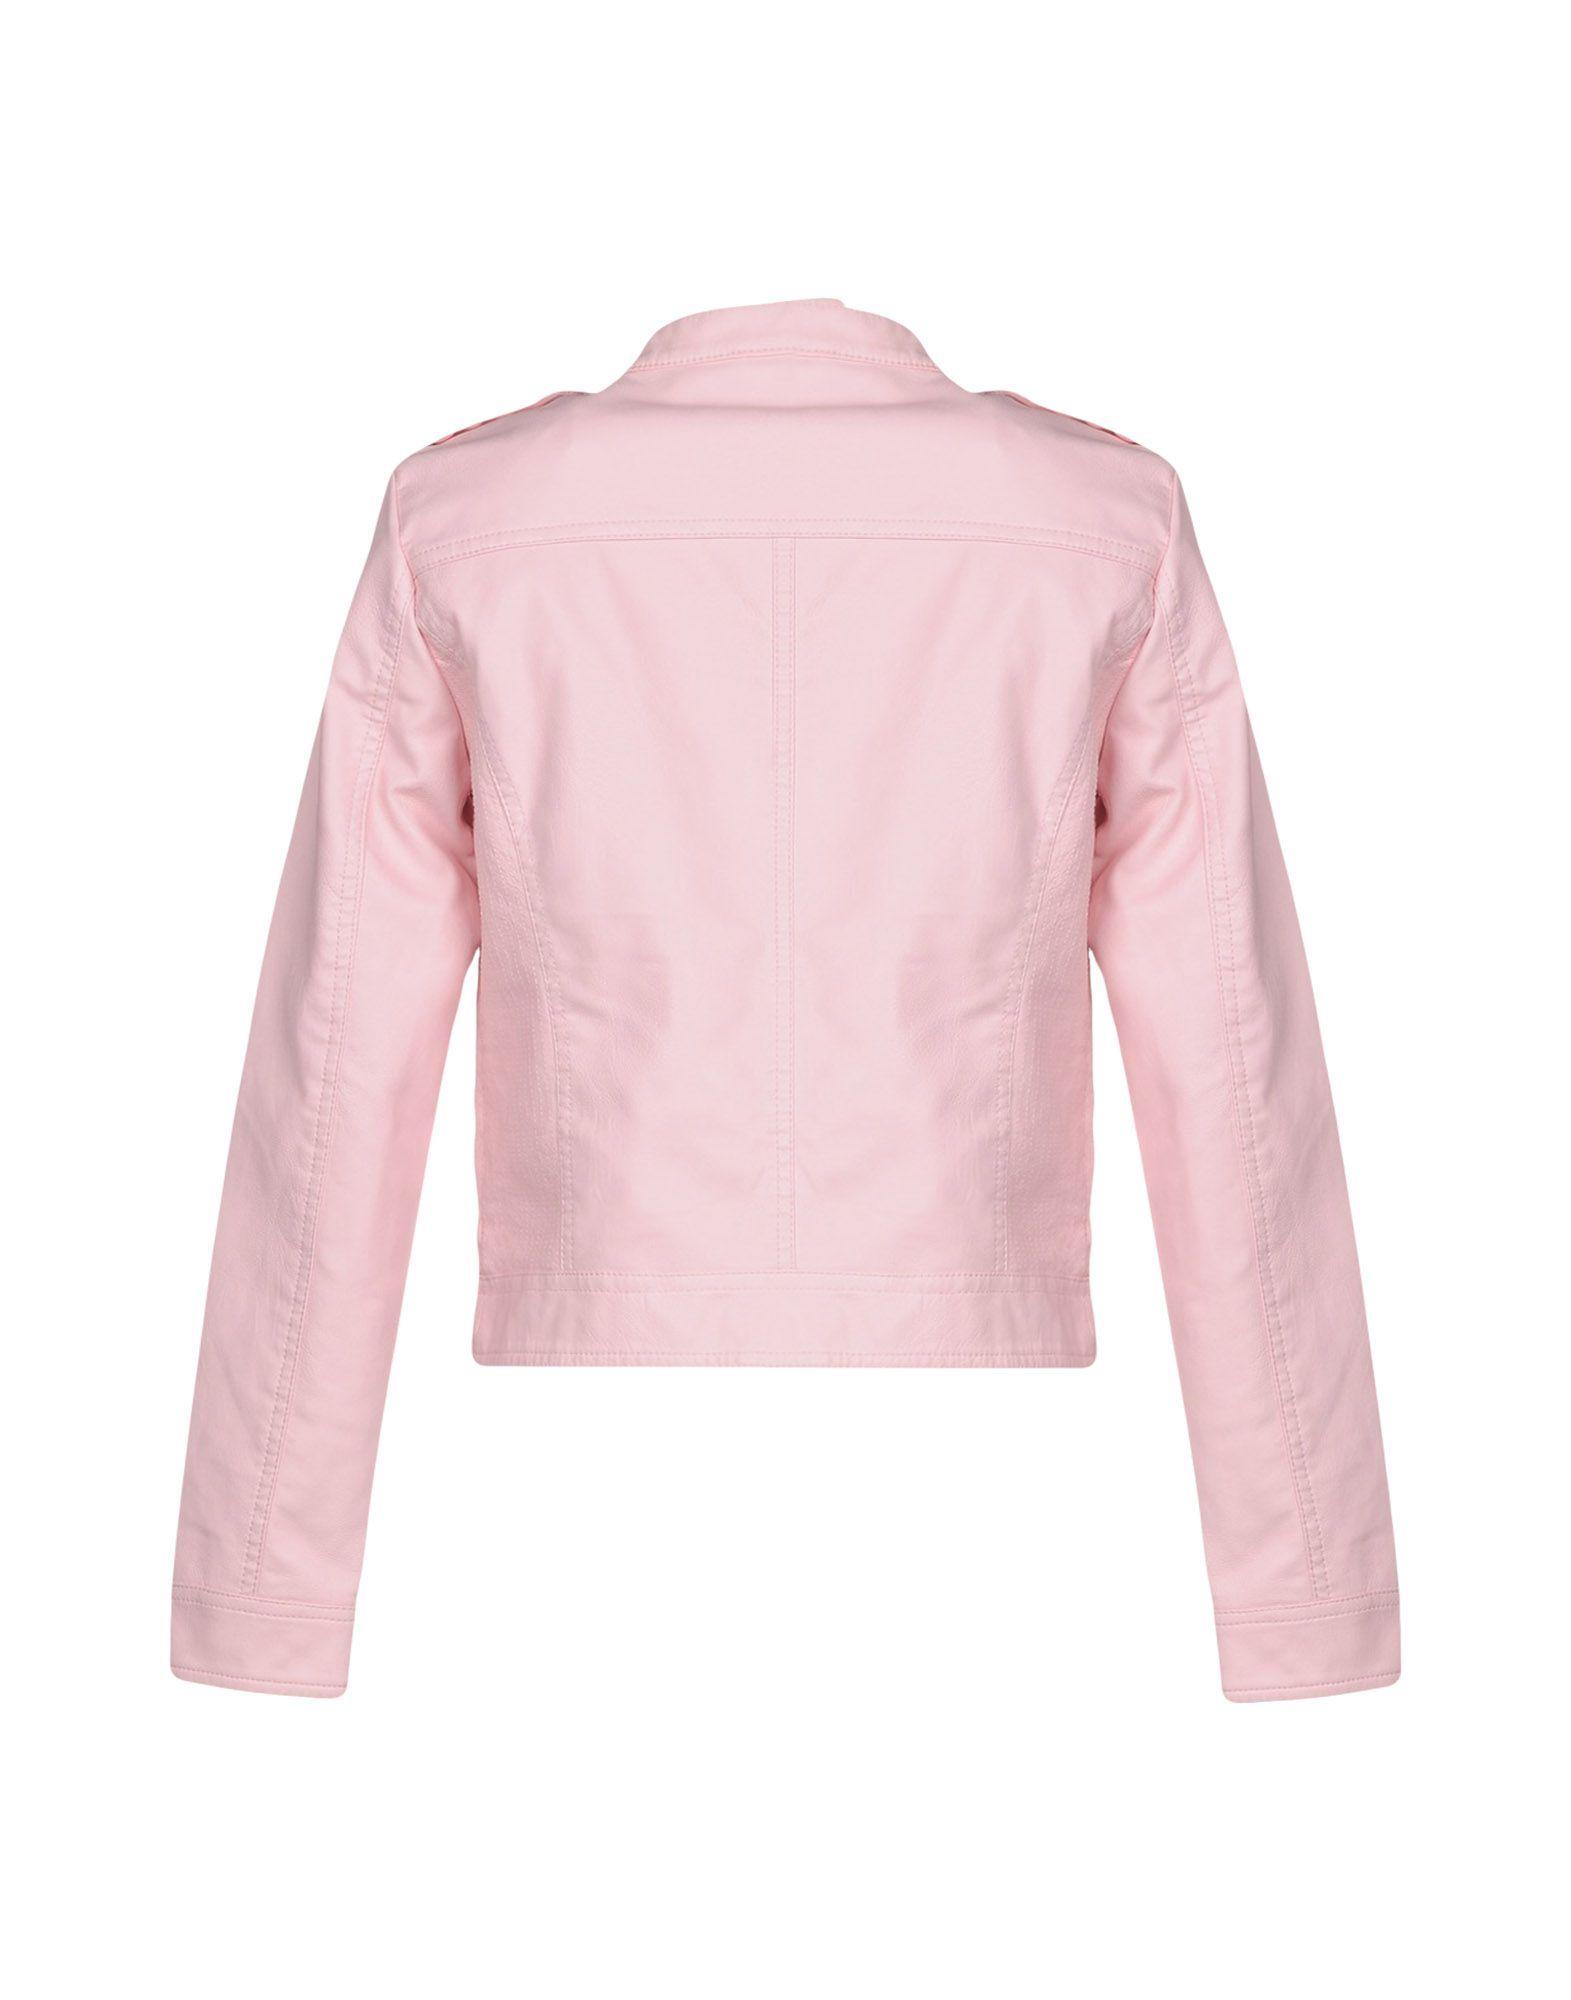 Vero Moda Pink Faux Leather Jacket